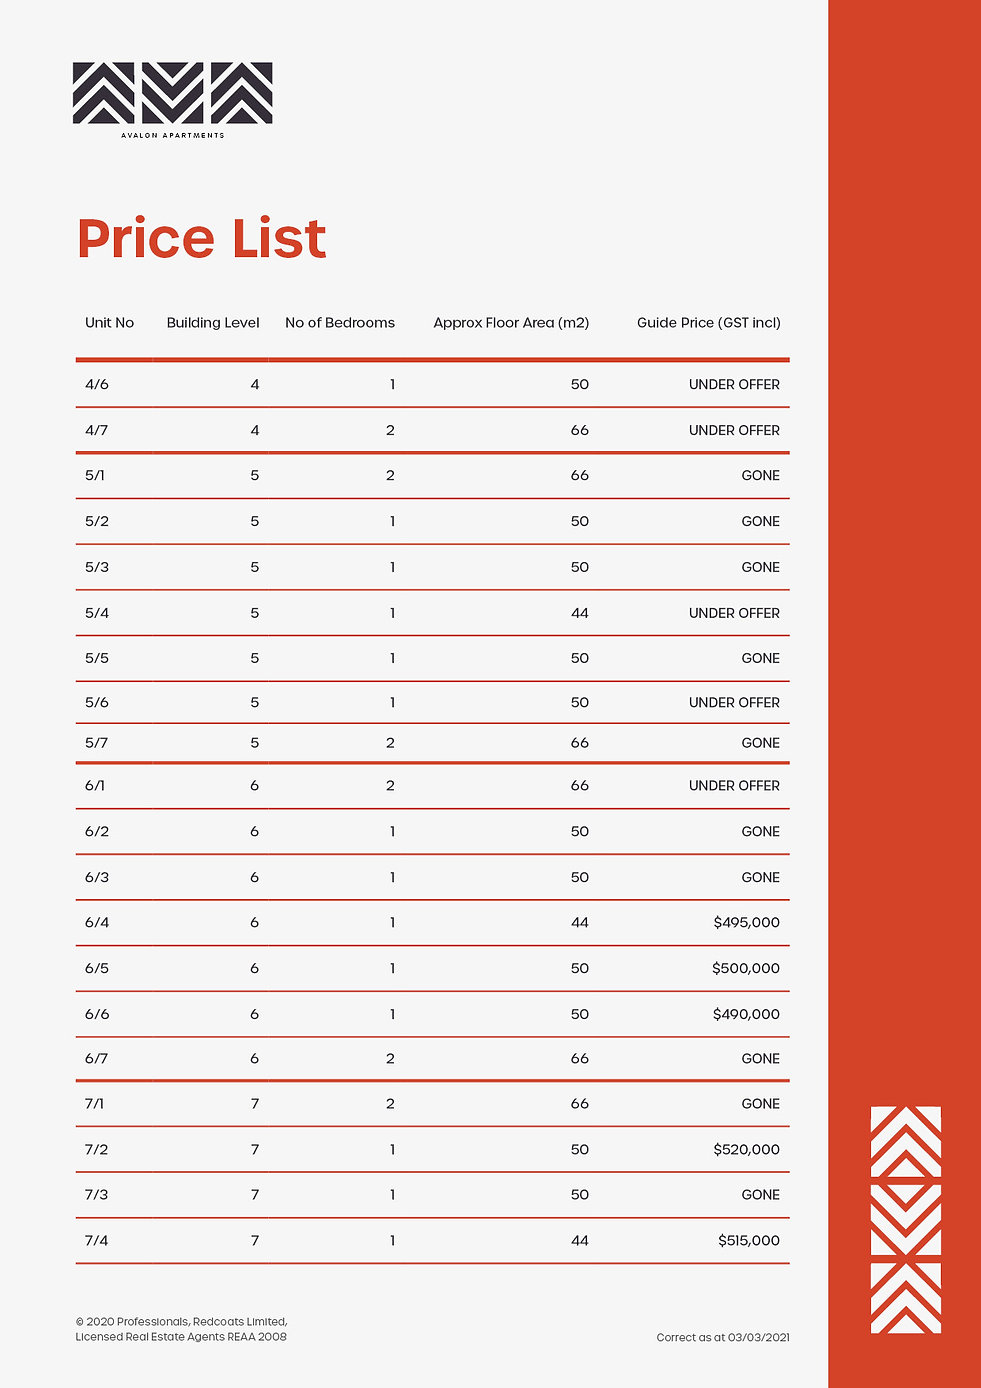 AA - Price List2.jpg